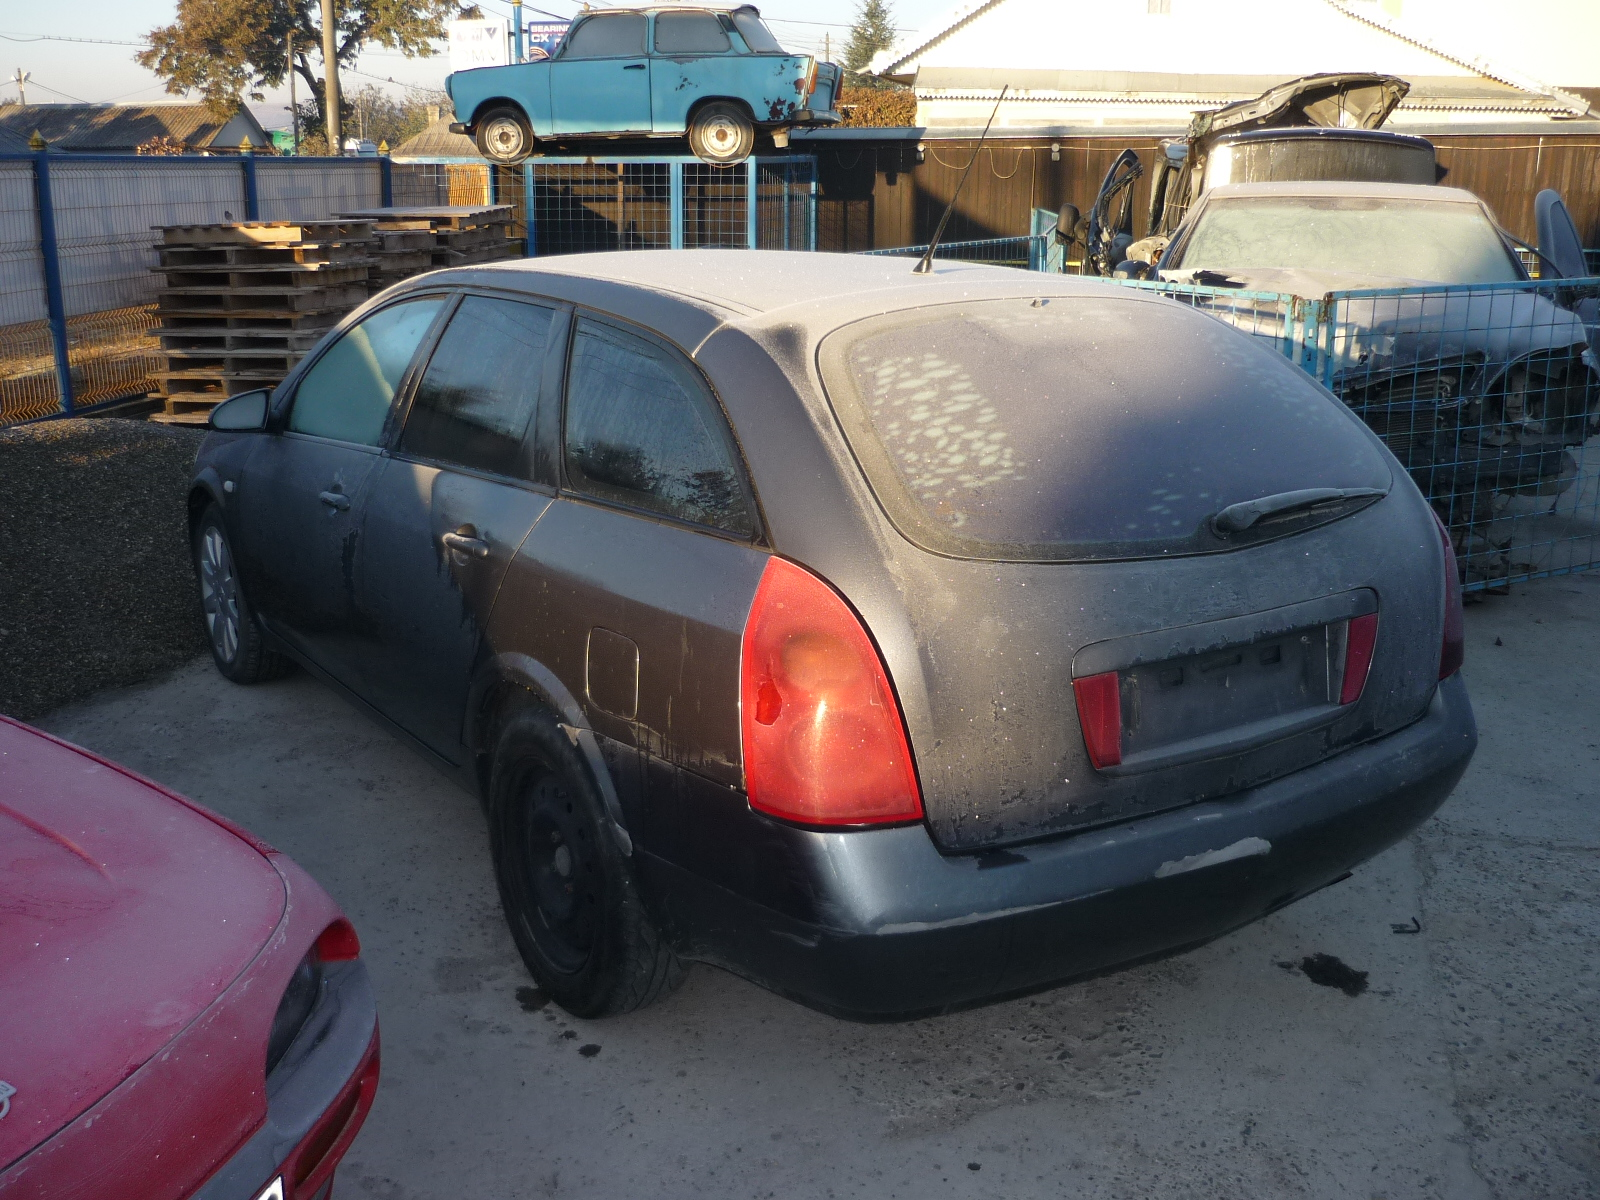 Dezmembrez Nissan Primera 2003 Diesel Combi - 19 Octombrie 2011 - Poza 1